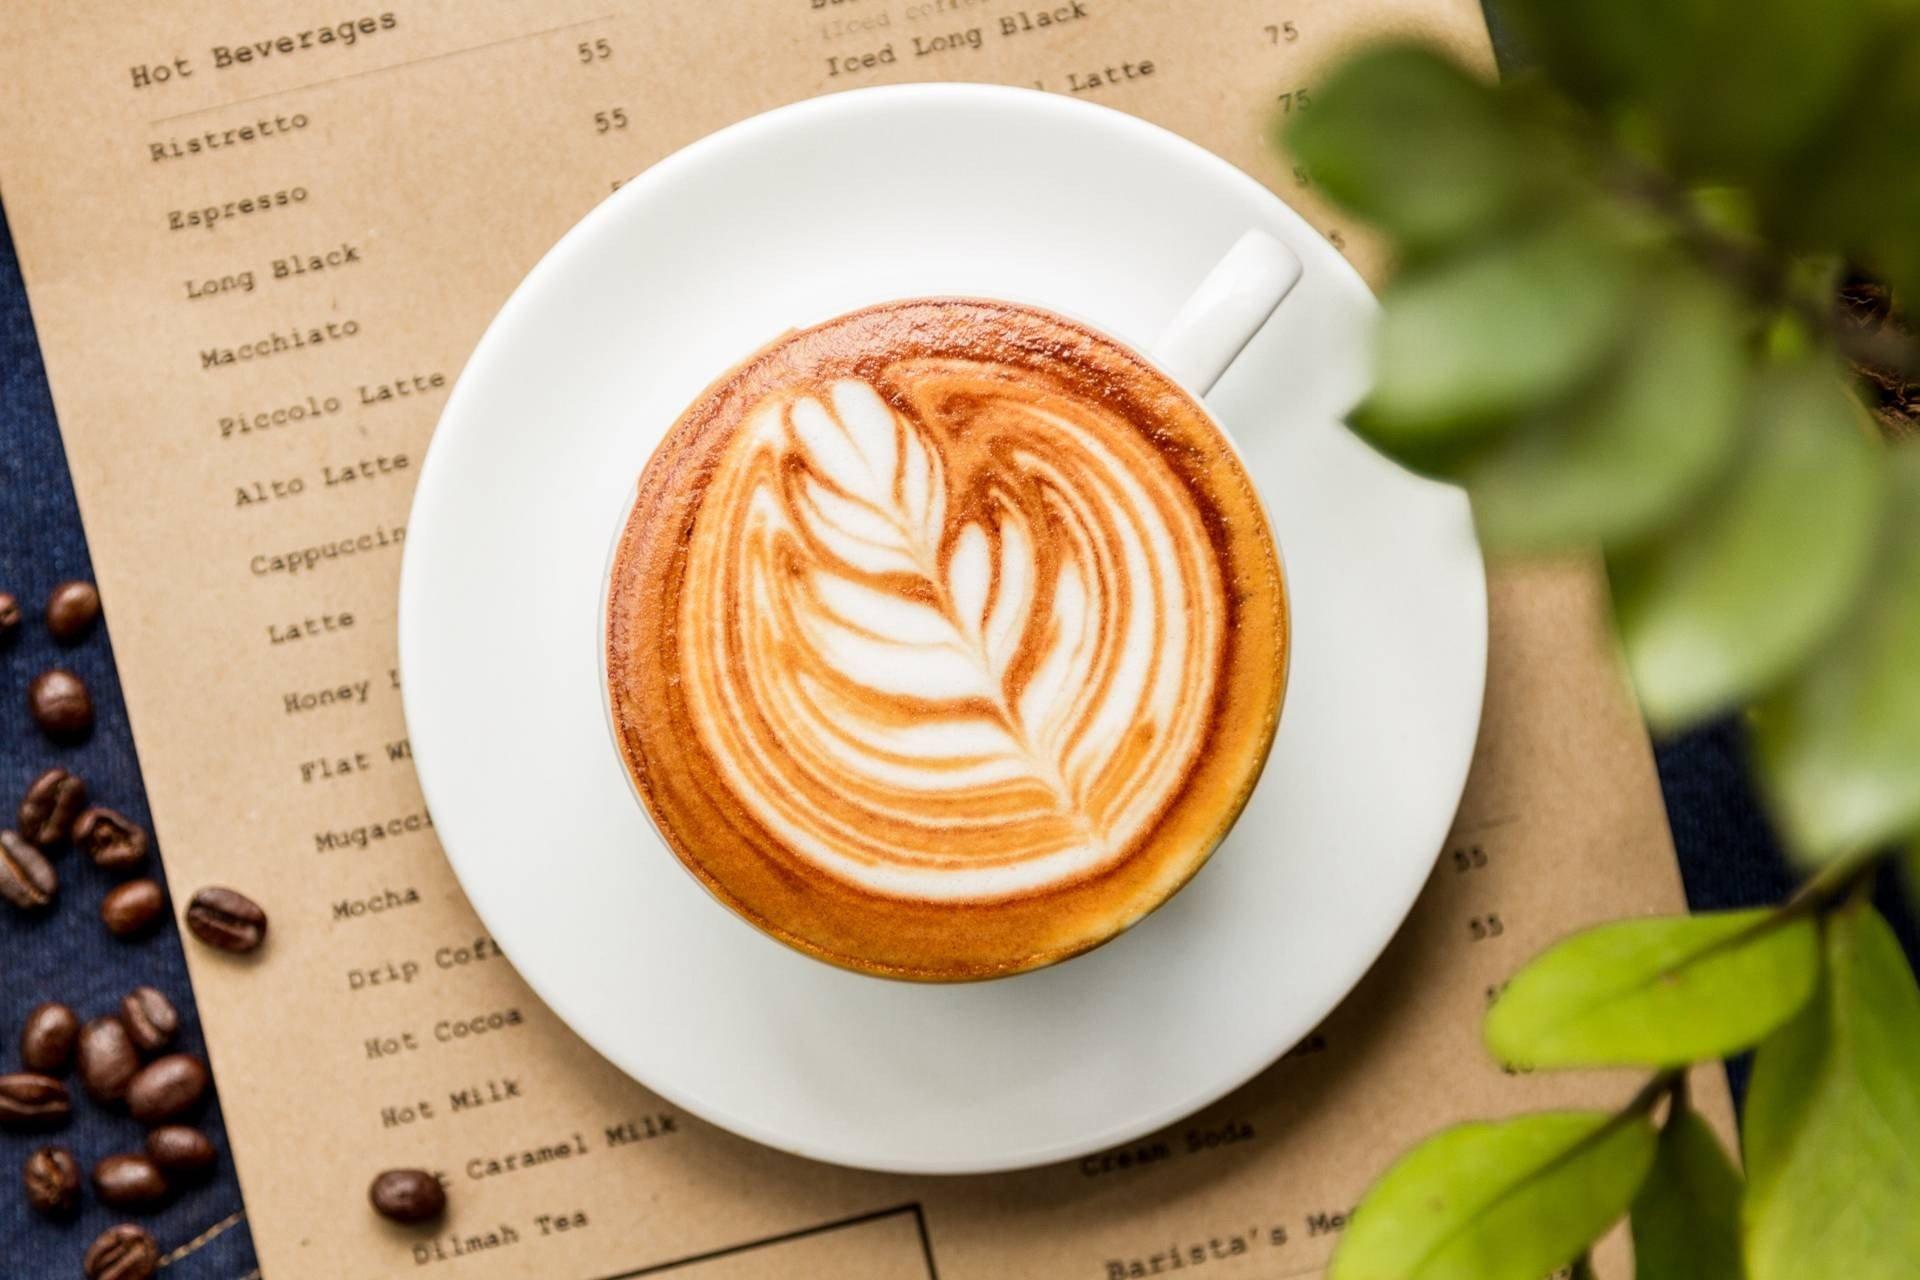 Burkta Coffee